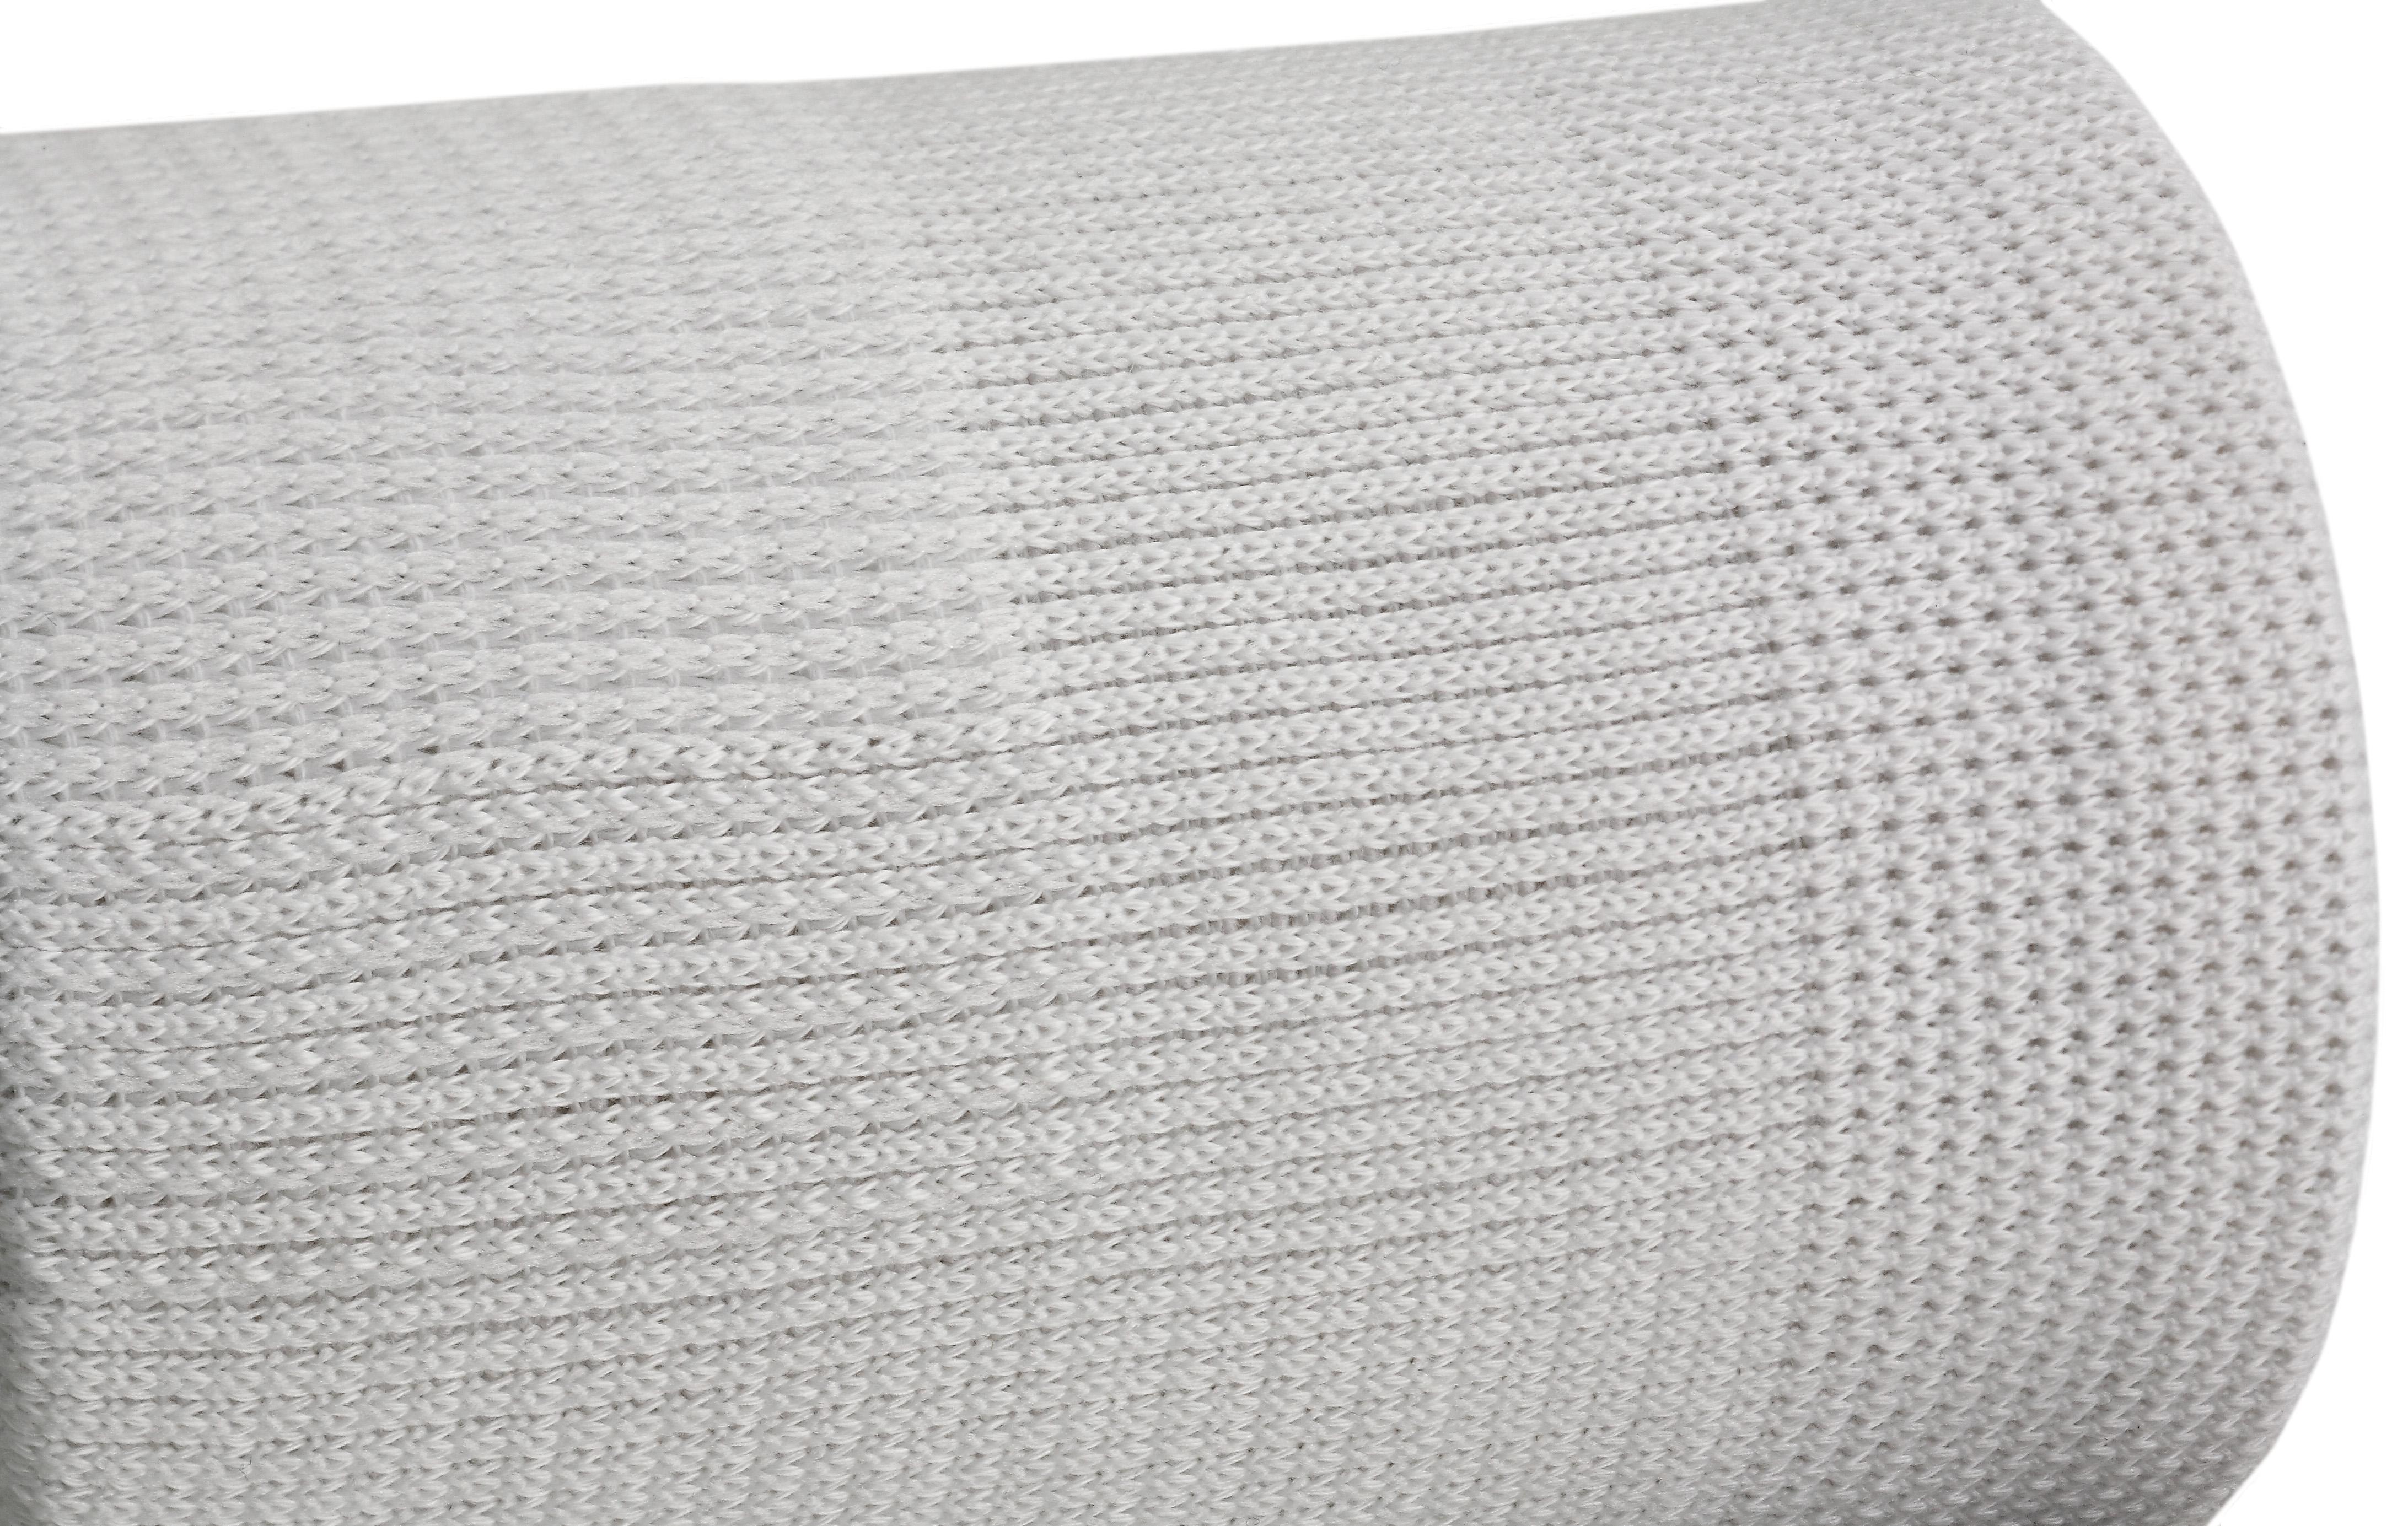 elastic-ankle-sleeve-lg-2543-ossur-os378312-2.jpg